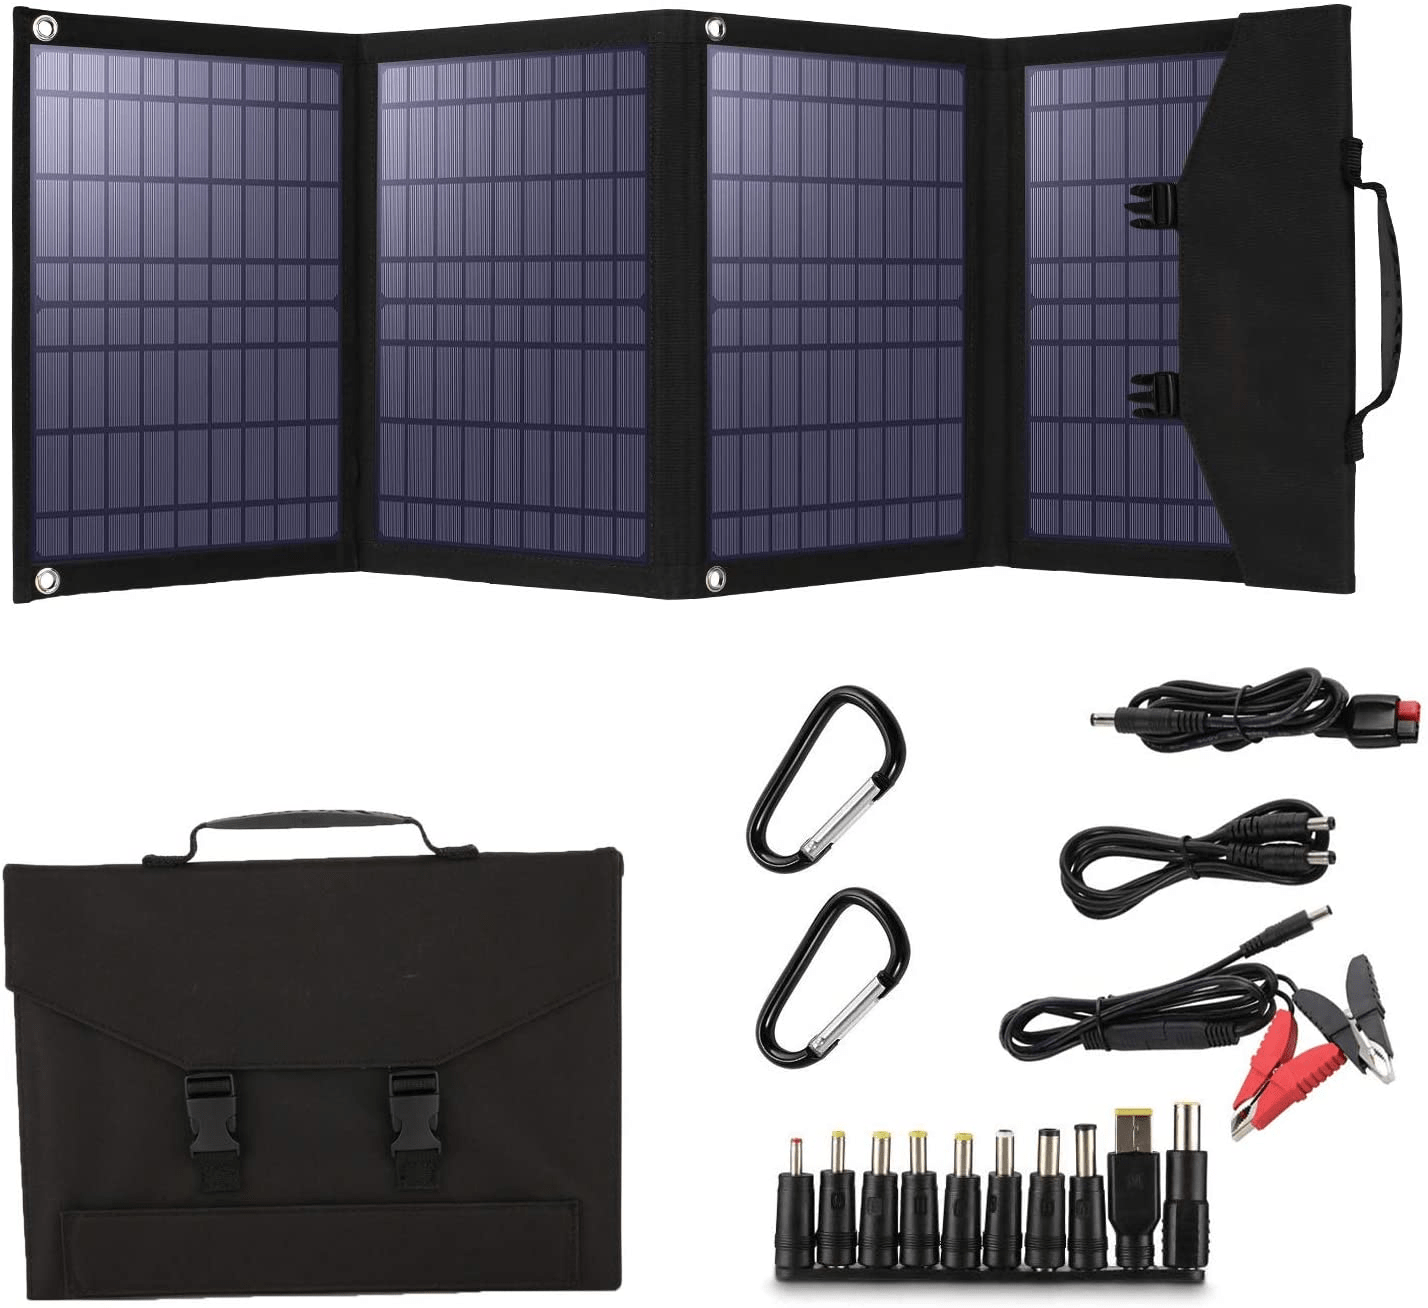 CHAKOR 120W Solar Panel